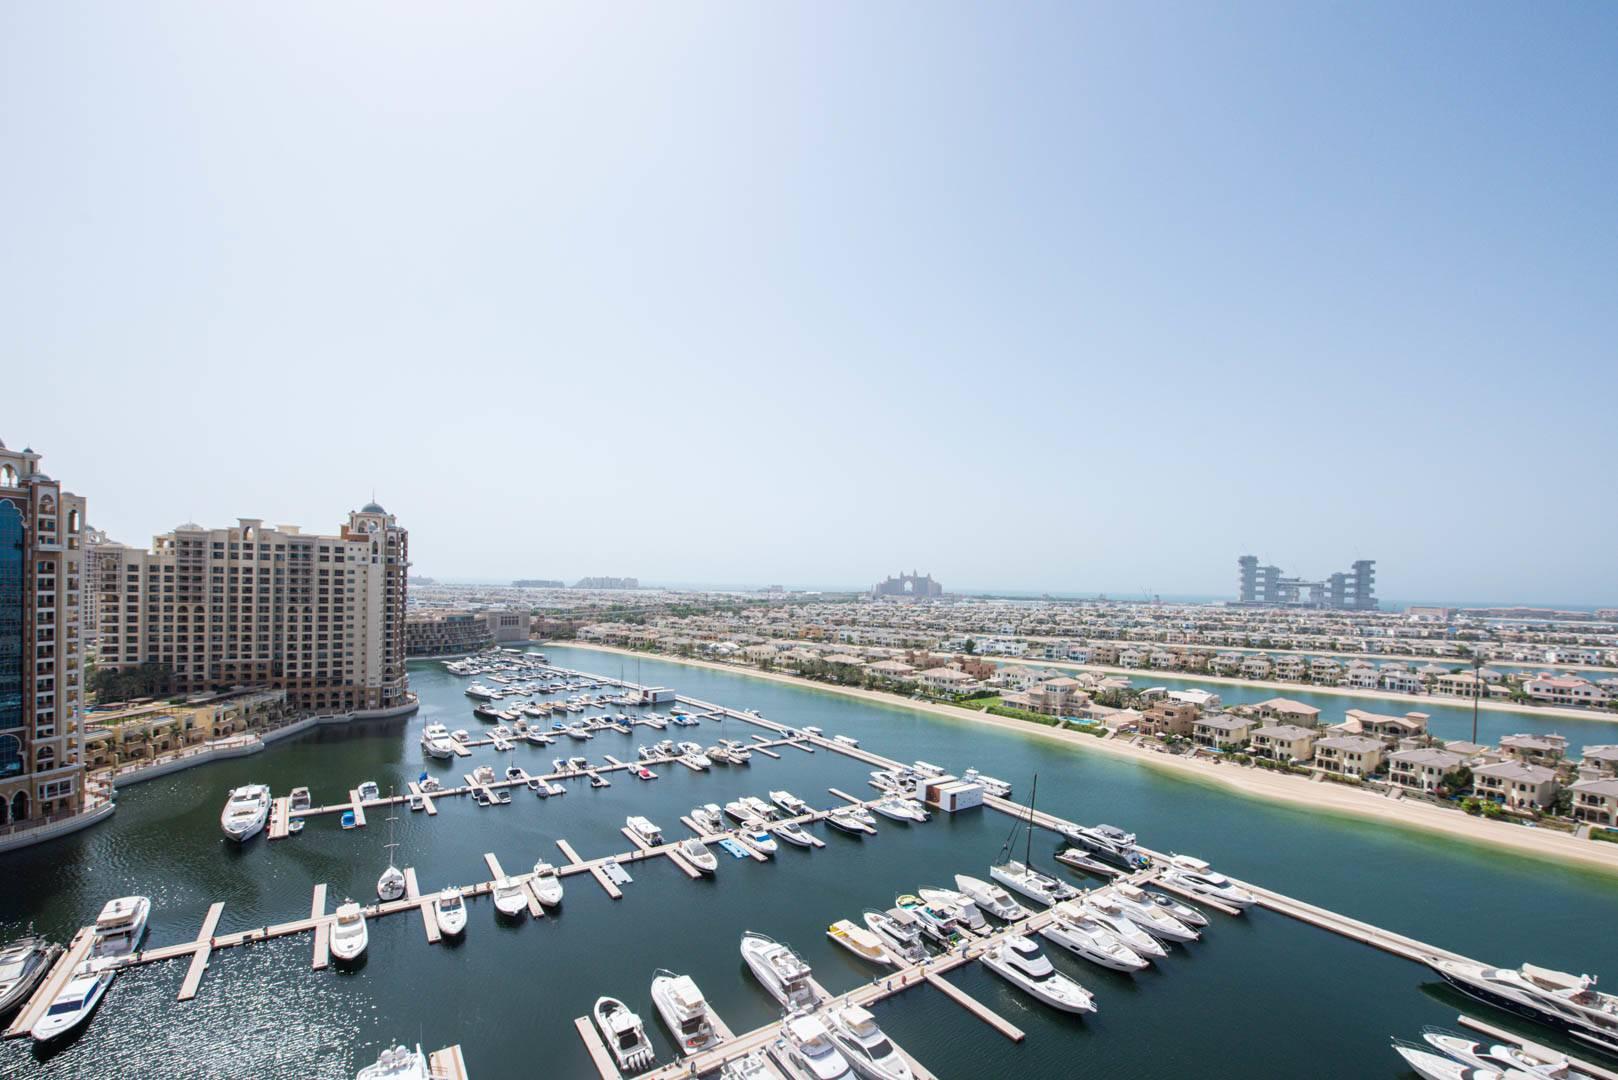 Апартаменты, sale в Tiara Дубай, ОАЭ